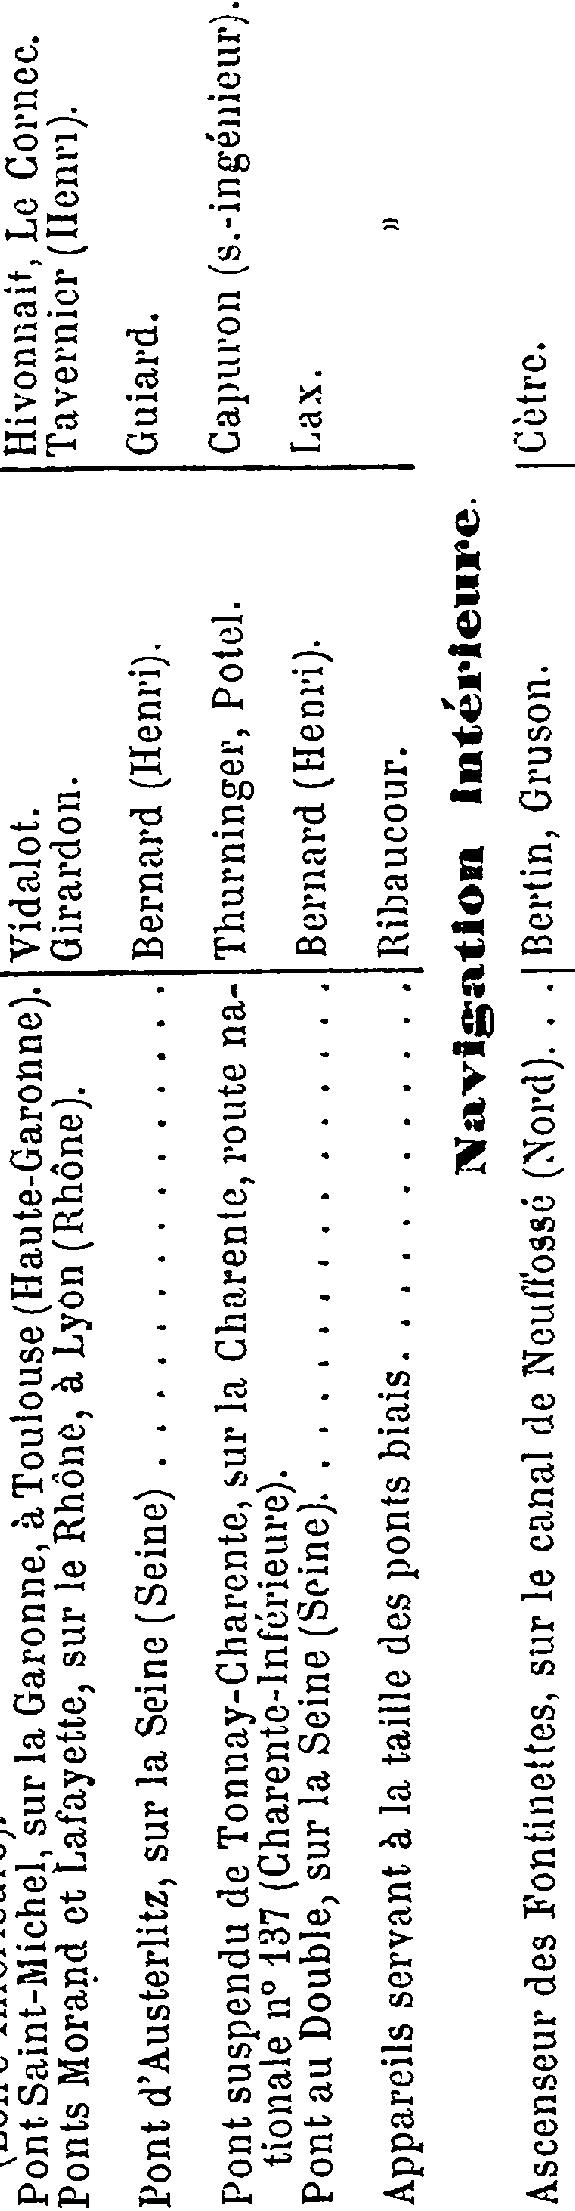 [subsumed][ocr errors][subsumed][subsumed][subsumed][subsumed][subsumed][subsumed][subsumed][subsumed][subsumed][subsumed][subsumed][ocr errors]